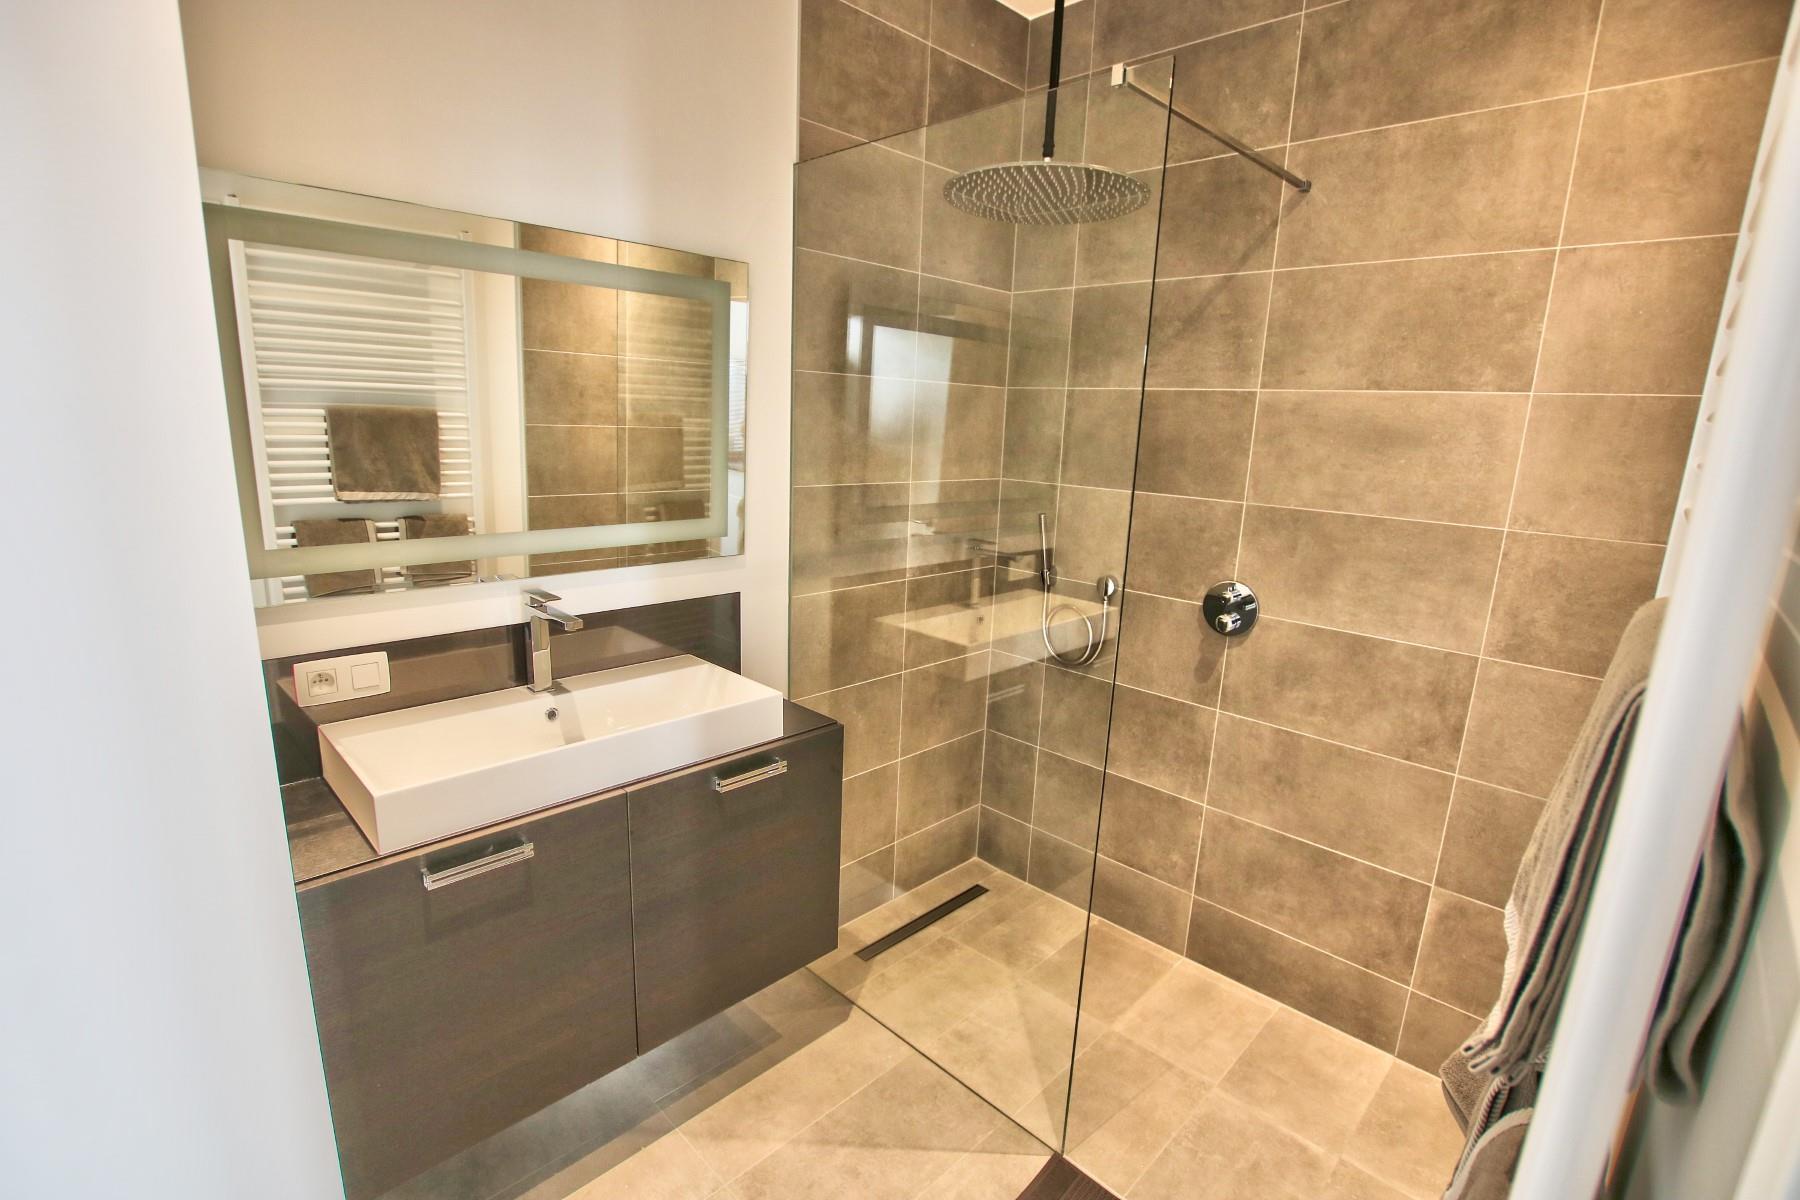 Appartement exceptionnel - Etterbeek - #4255737-8